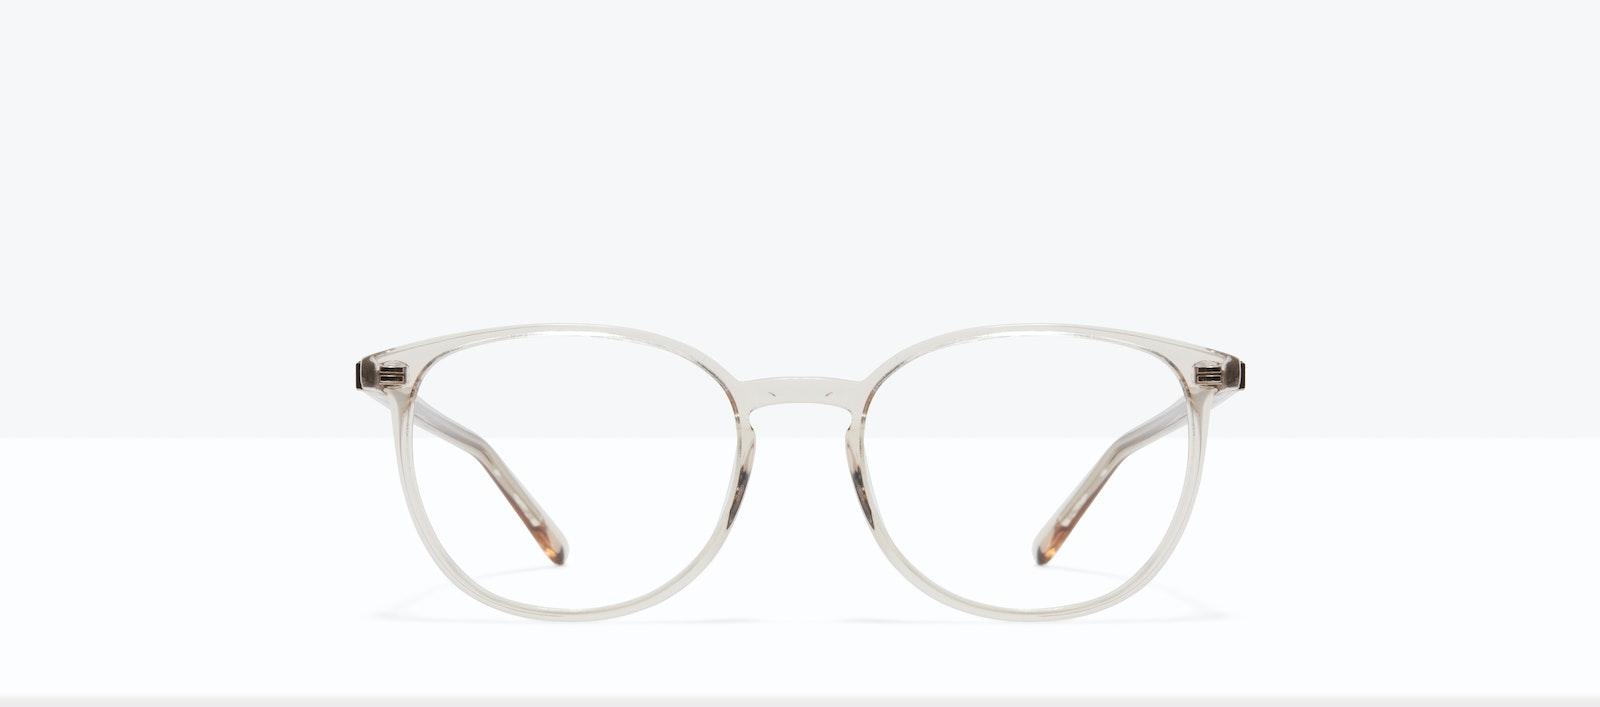 Affordable Fashion Glasses Round Eyeglasses Women Femme Libre S Margo Front